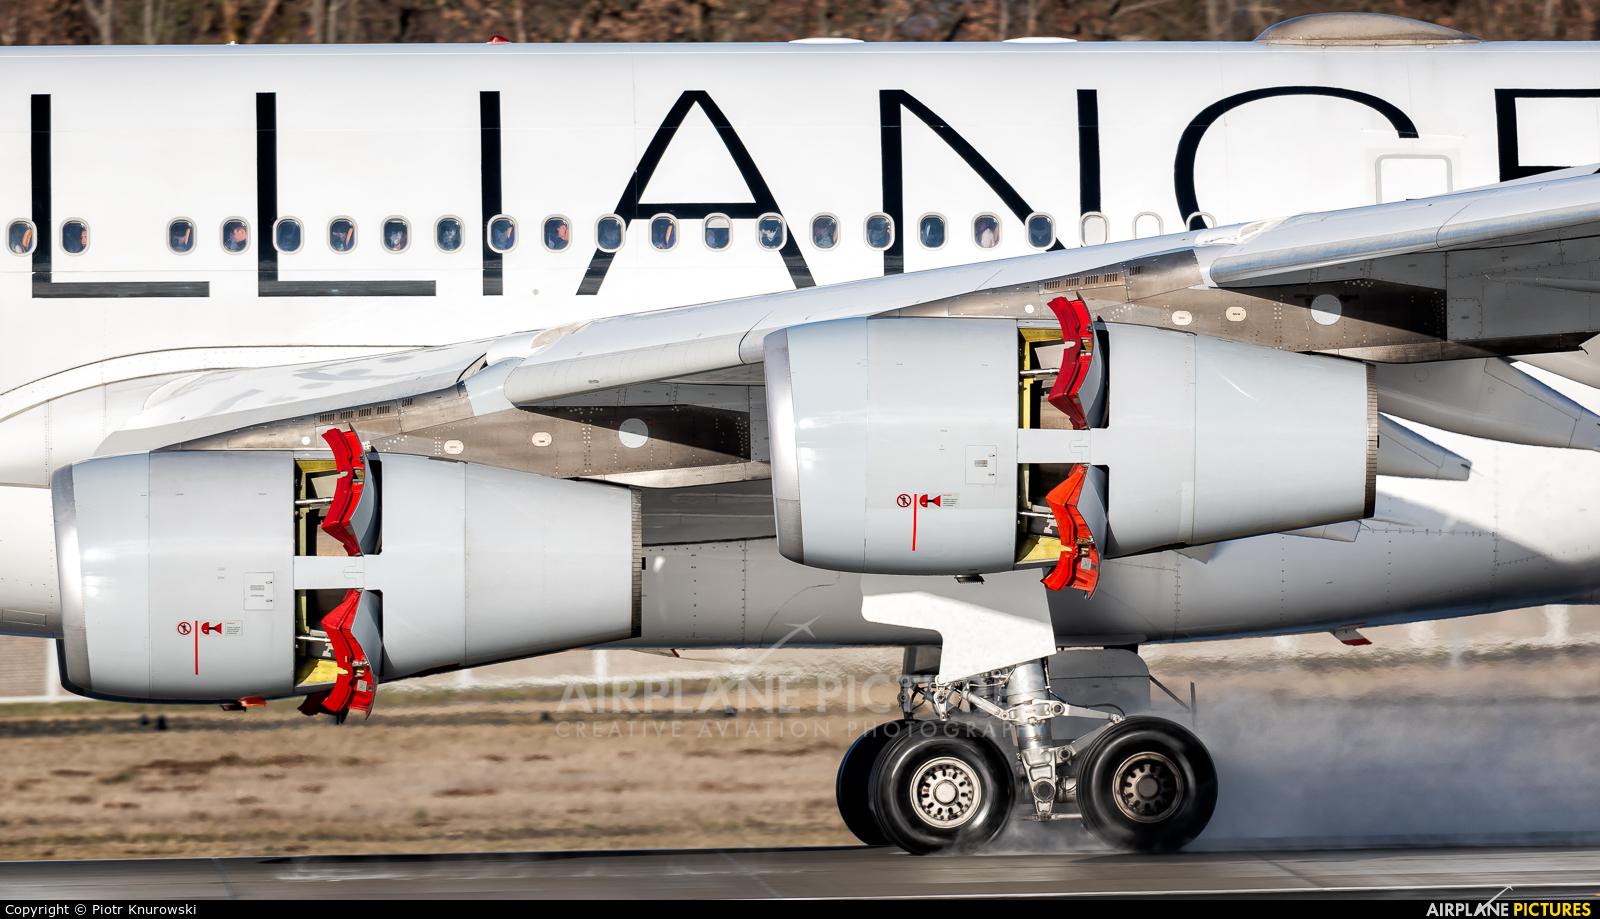 Lufthansa D-AIFF aircraft at Frankfurt